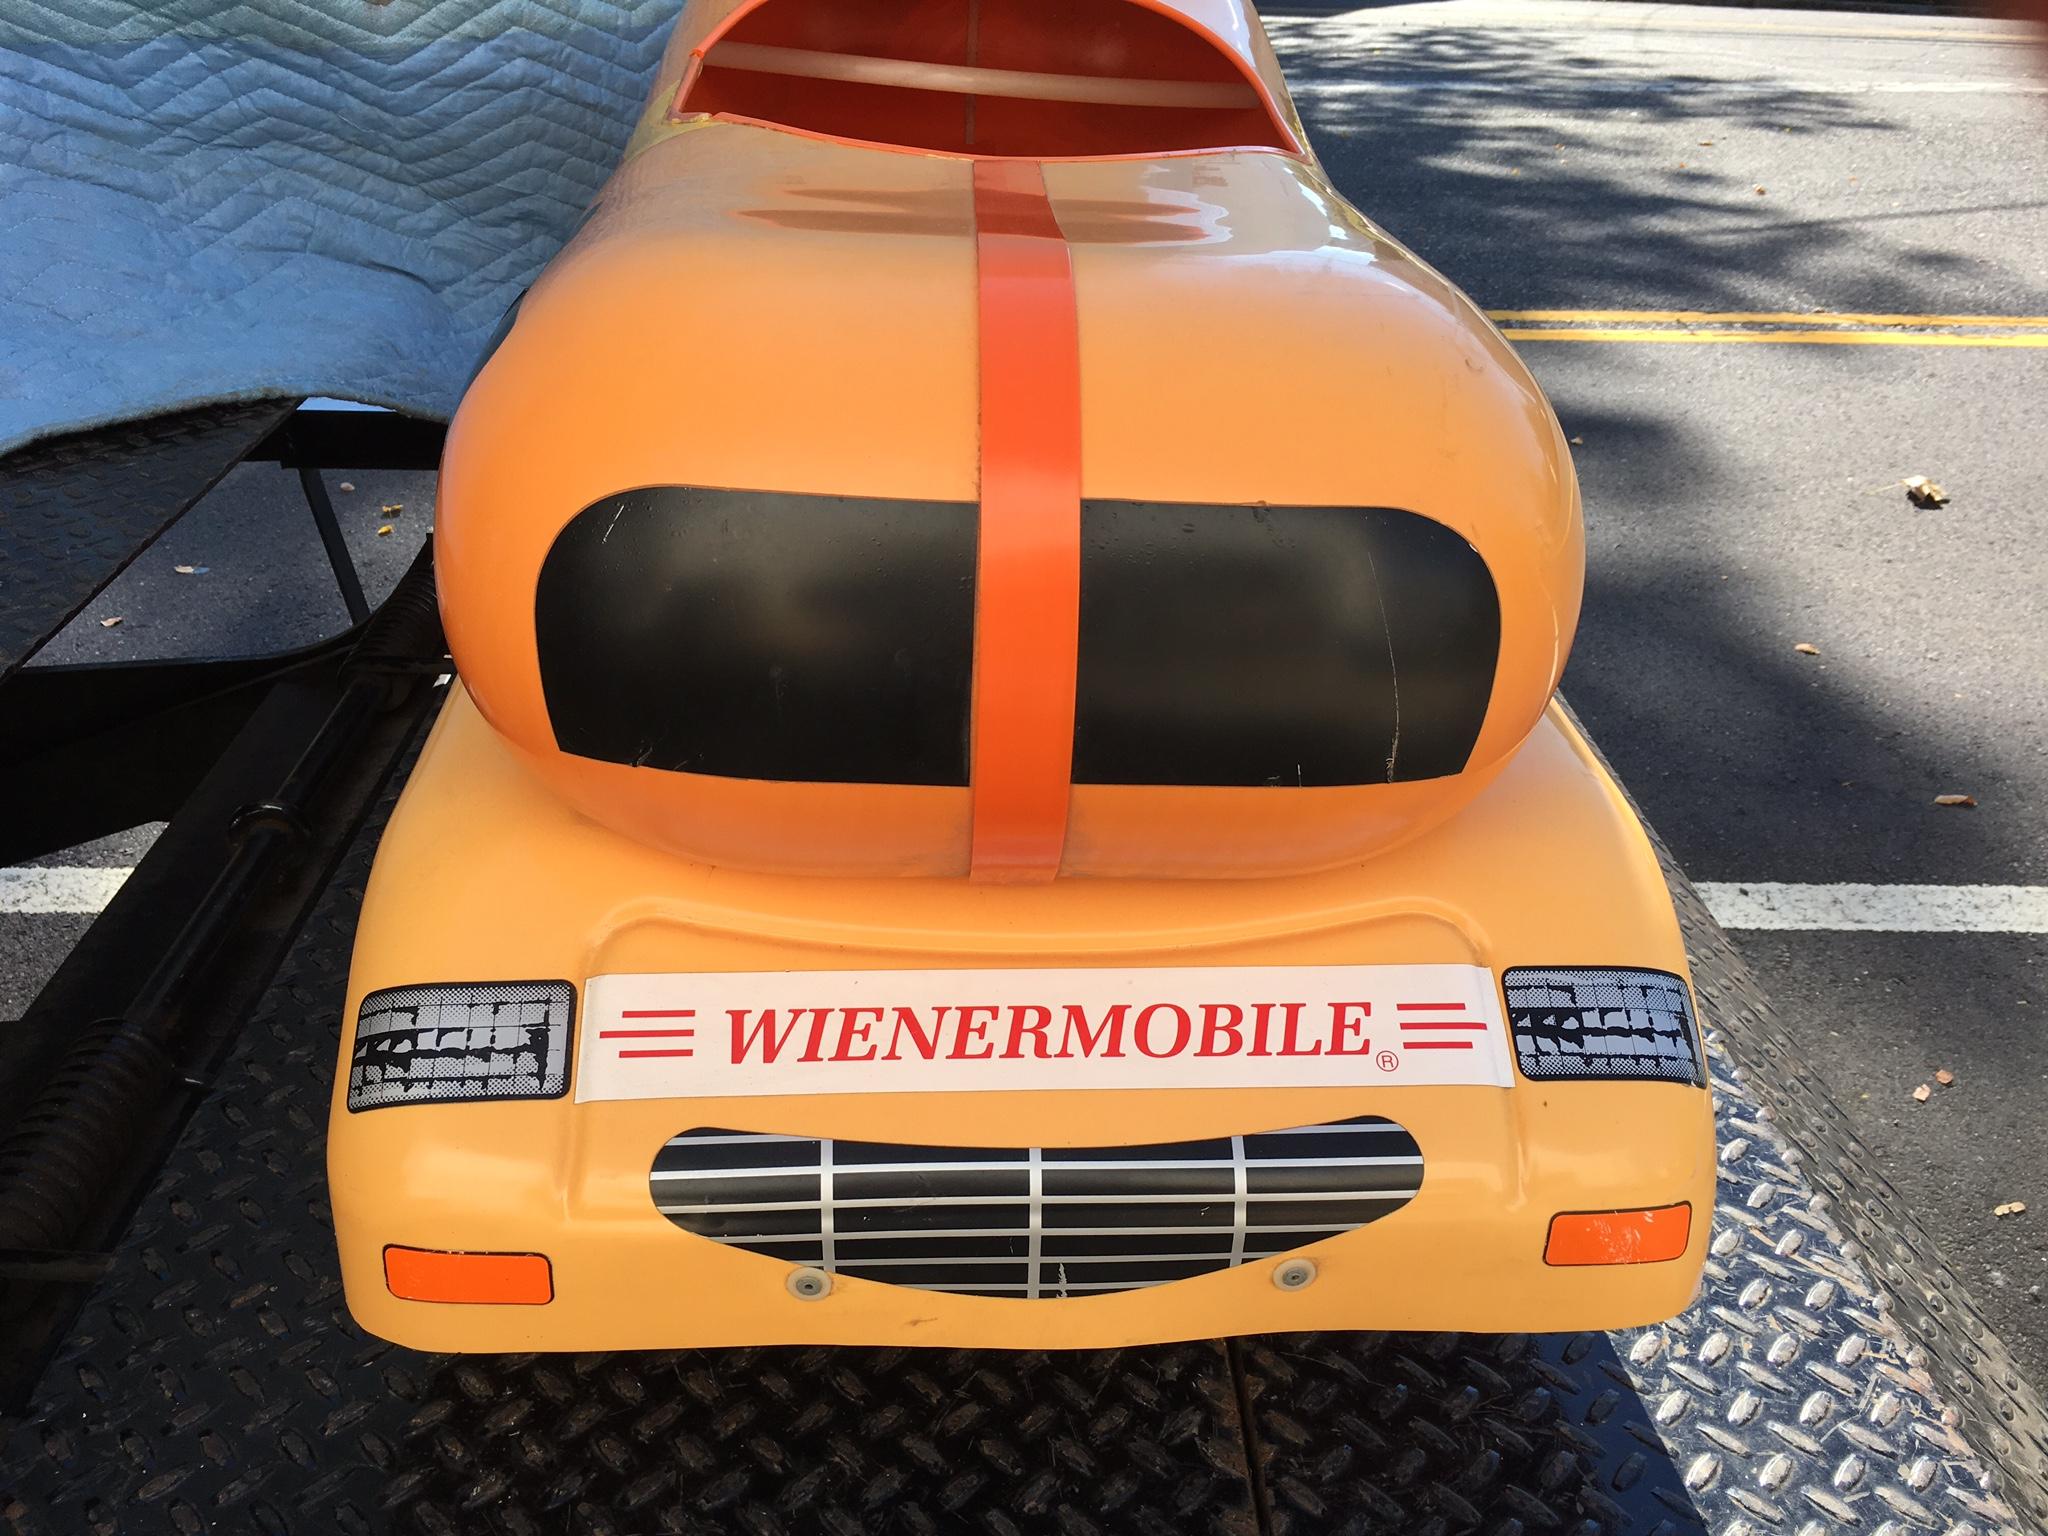 Index additionally Oscar Mayer Wienermobile likewise Oscar Mayer Weiner Mobile moreover Oscar Mayer Wienermoblie Pedal Car also Oscar Mayer Wienermobile. on oscar mayer meyer wienermobile pedal